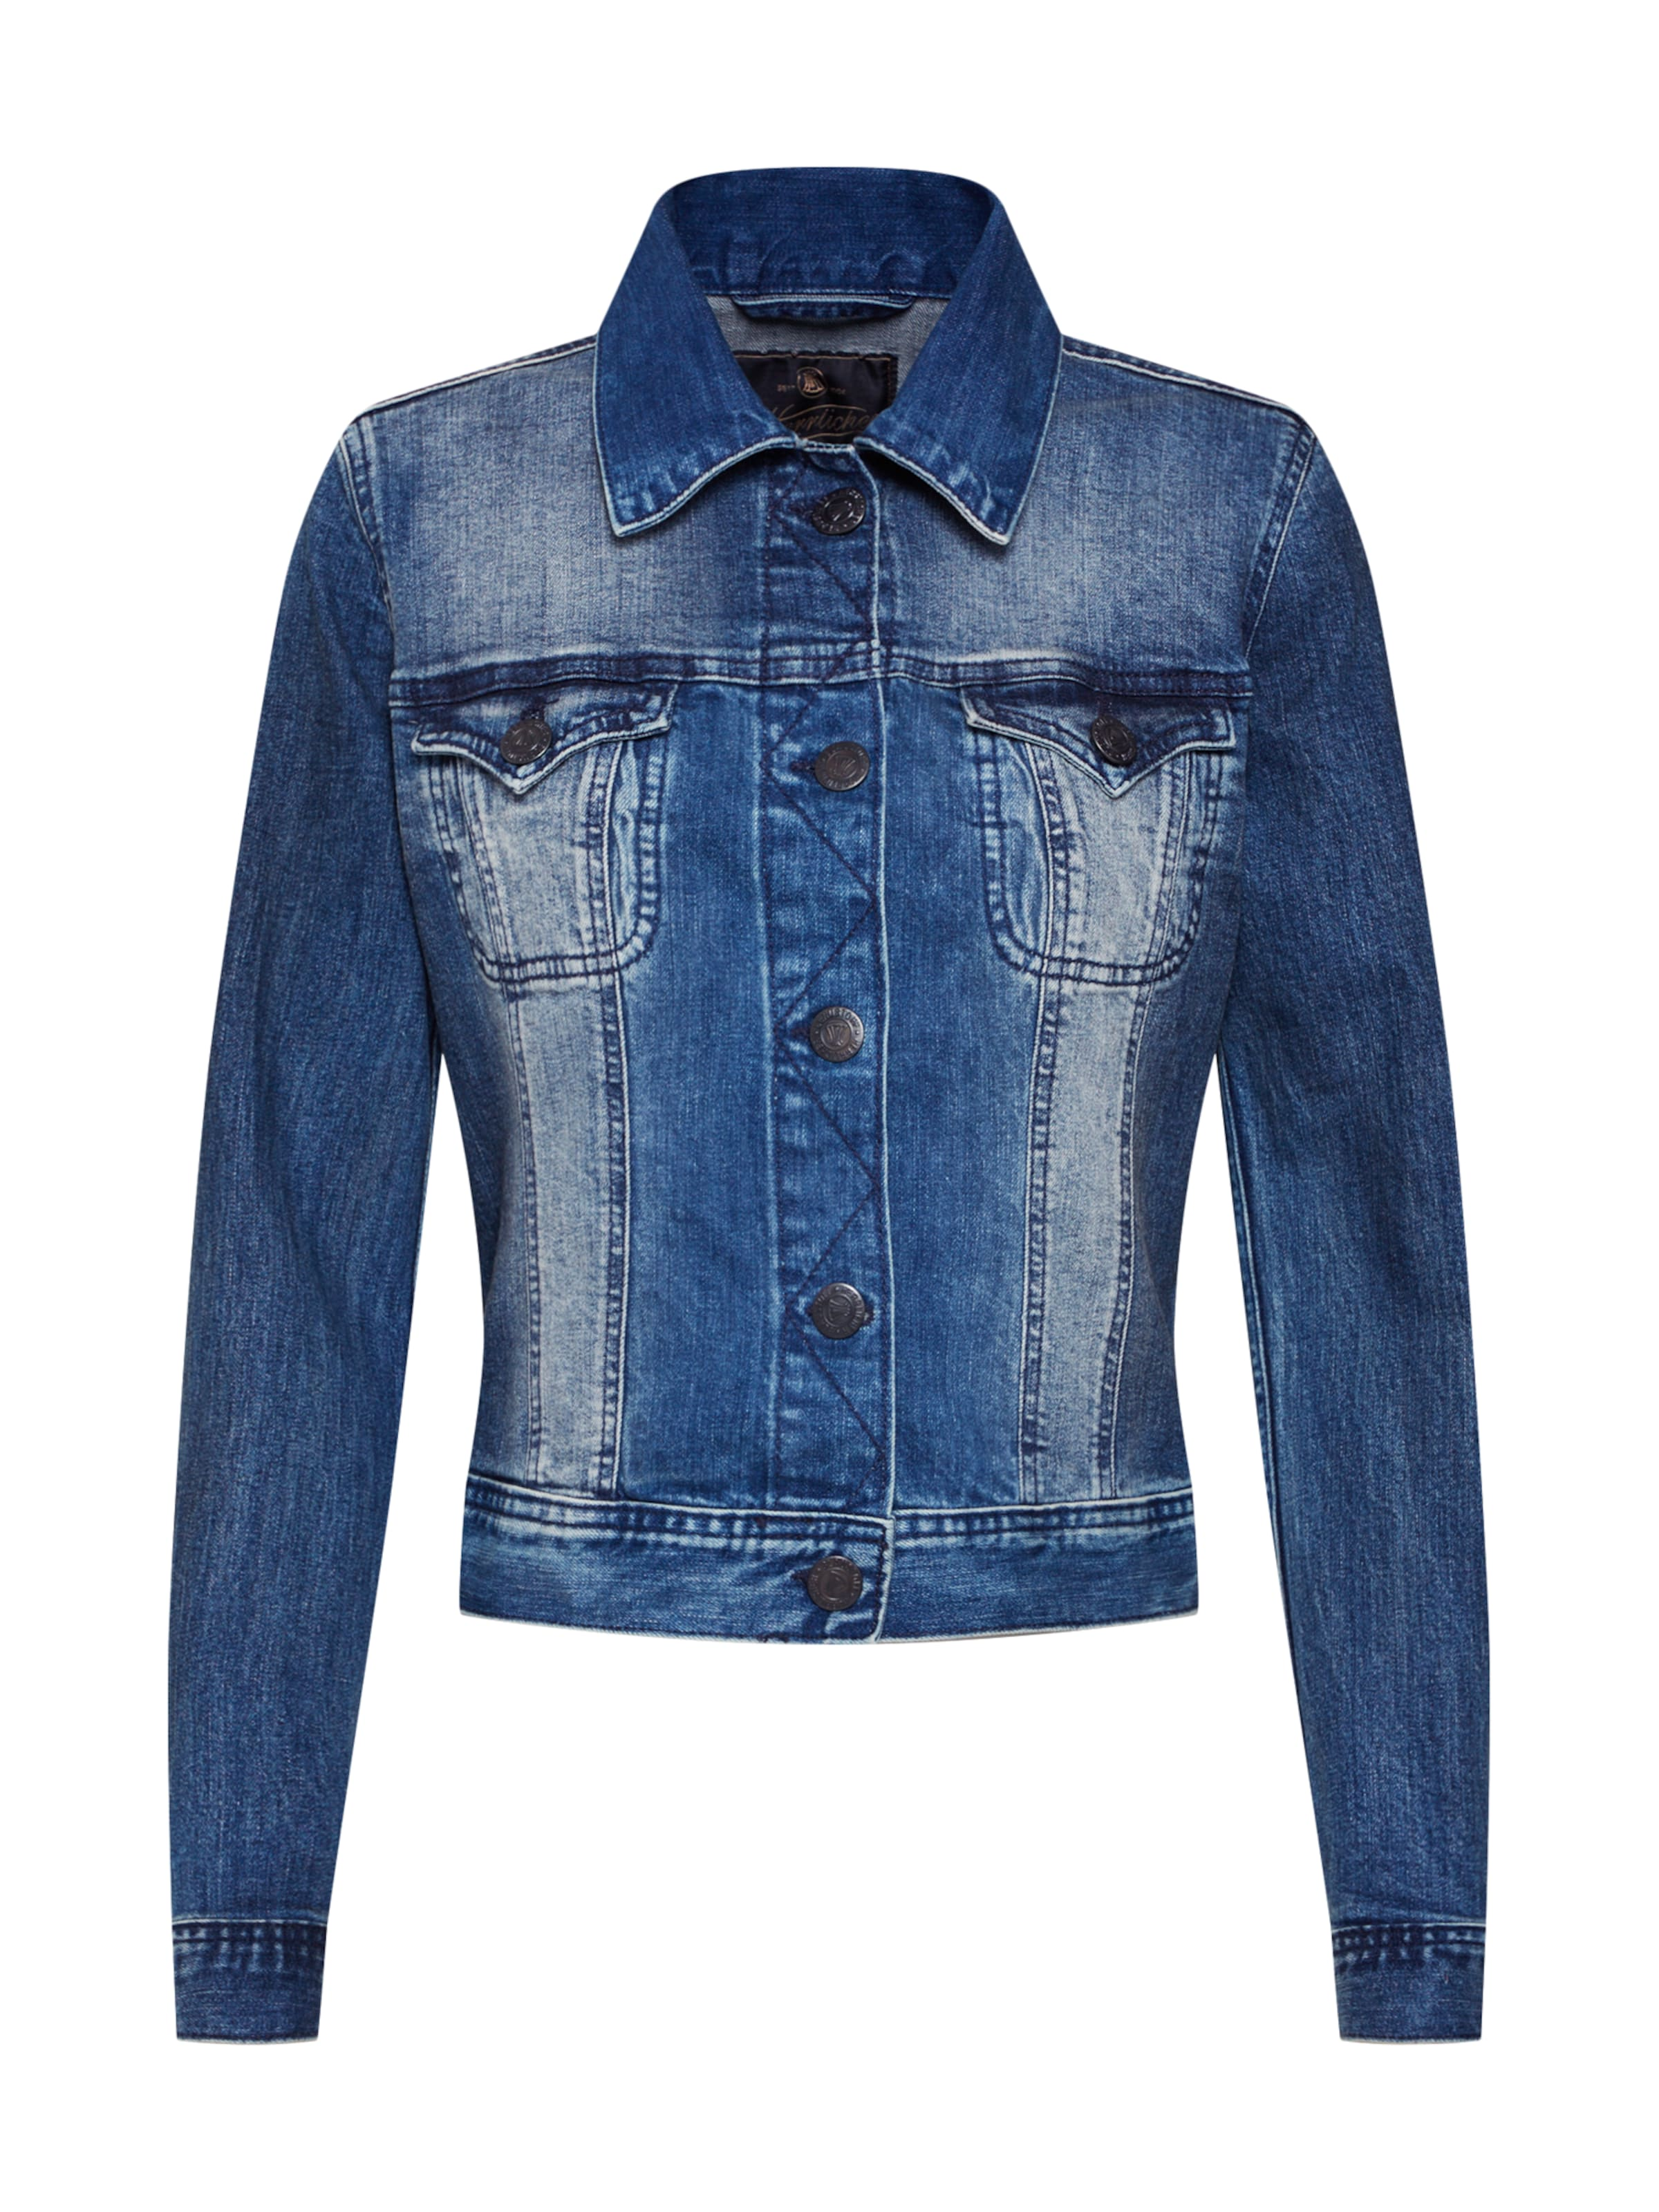 Denim In 'joplin' Blue Herrlicher Jeansjacke wPNZ80kXnO